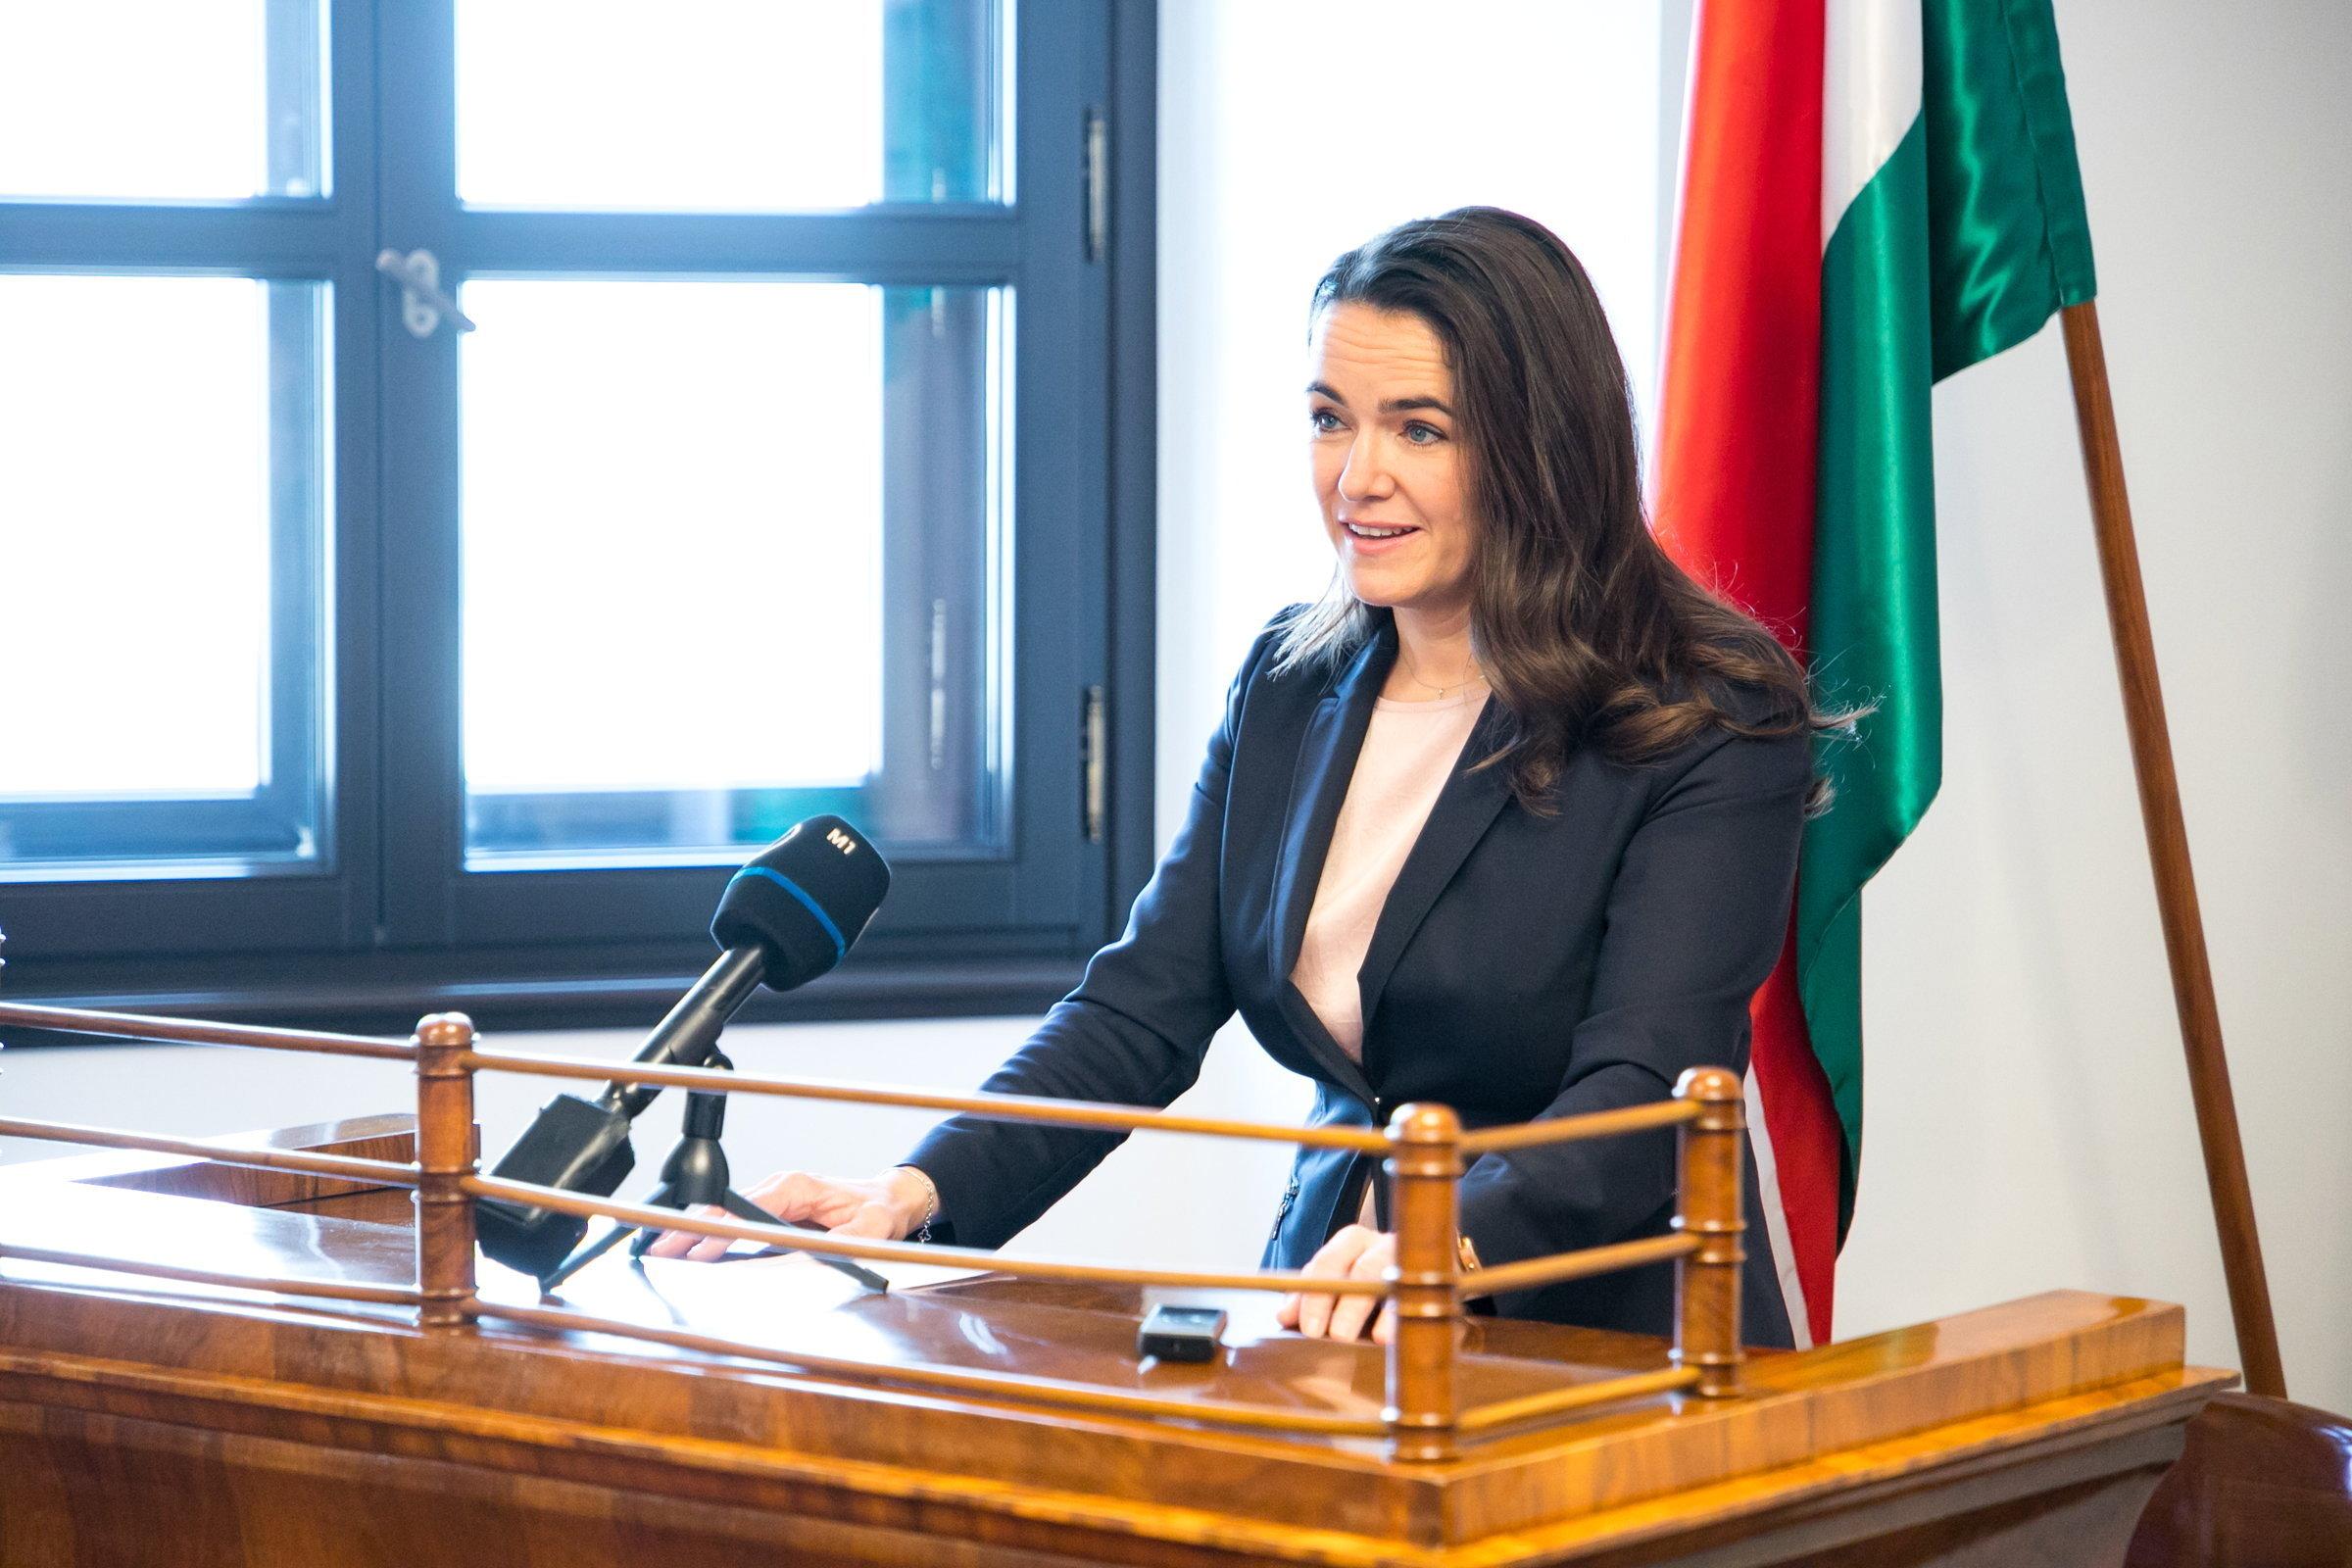 Family Minister: 2010-2020 Hungary's Decade of 'Demographic Turnaround'